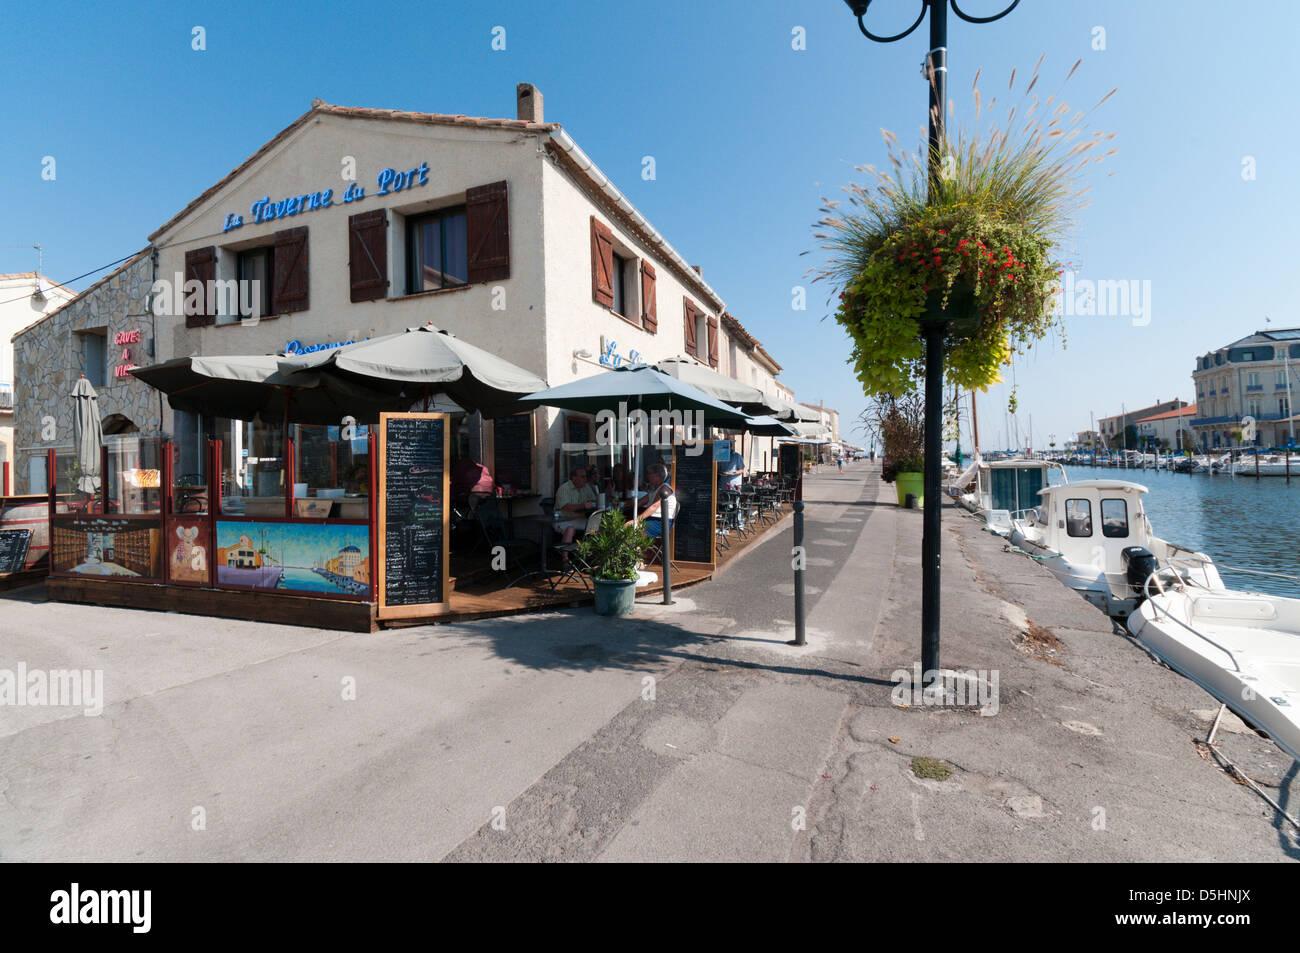 La Taverne du Port restaurant on the harbour front at Marseillan, Languedoc, France Stock Photo